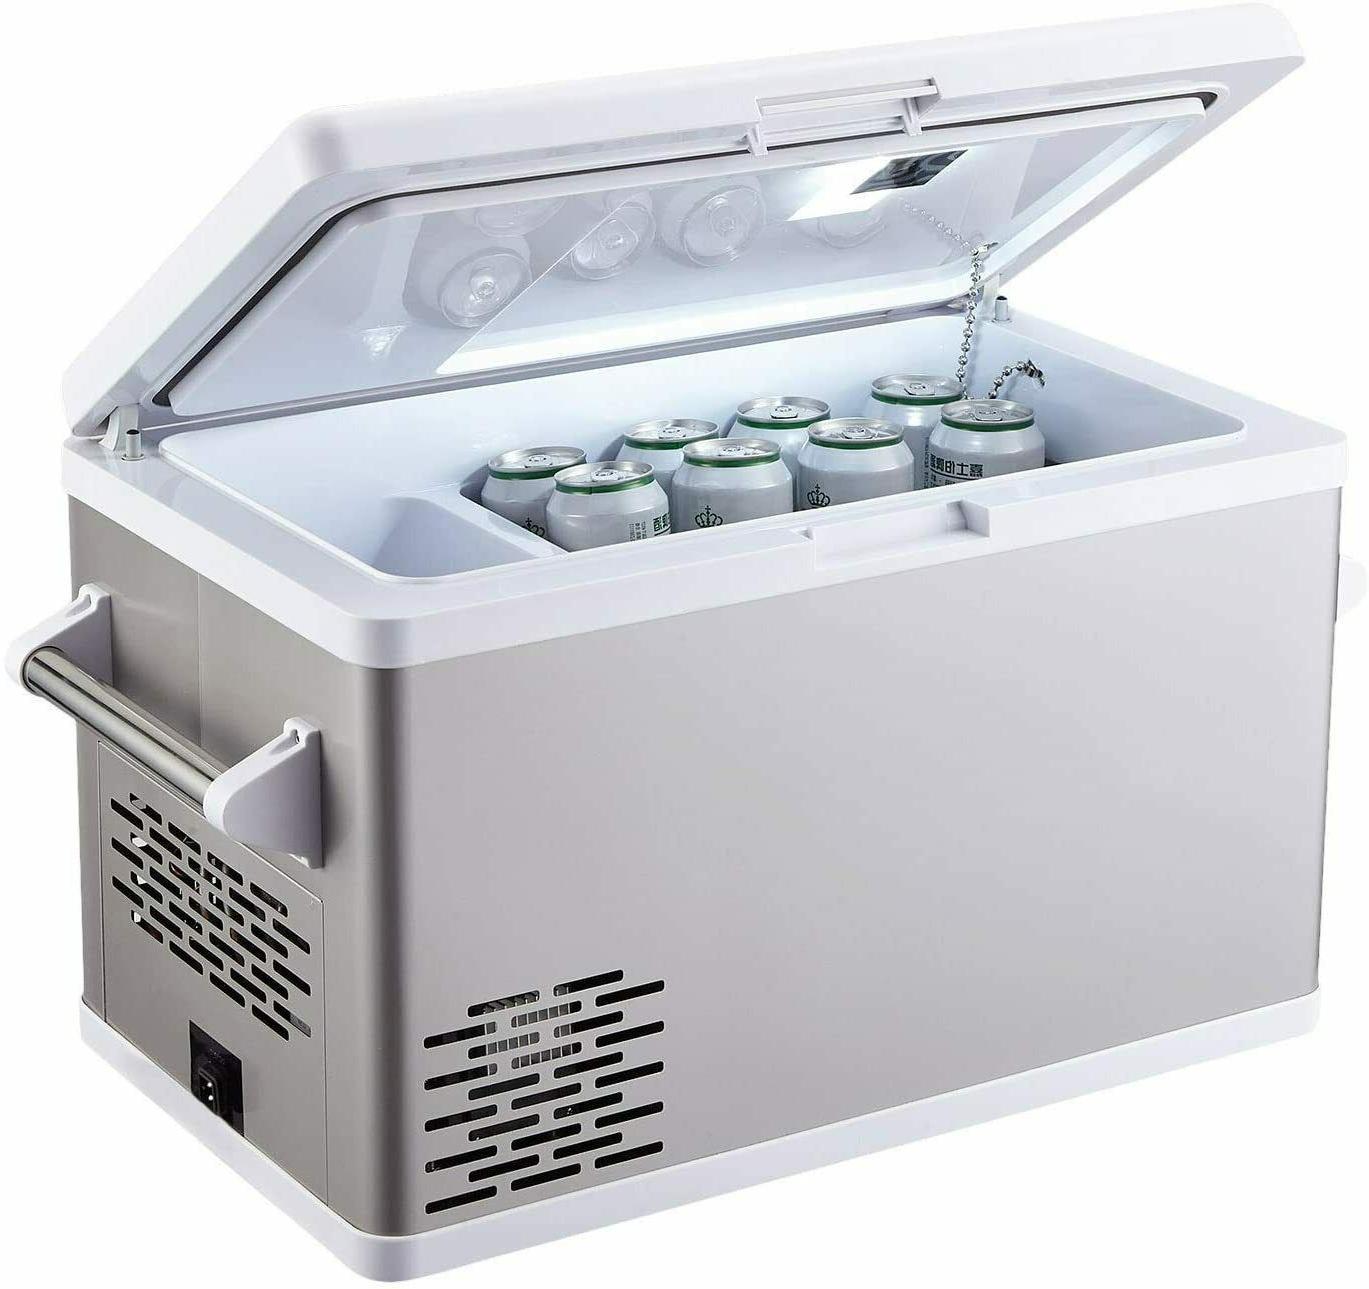 Aspenora Fridge Freezer 12V Car Compressor ~ 68℉